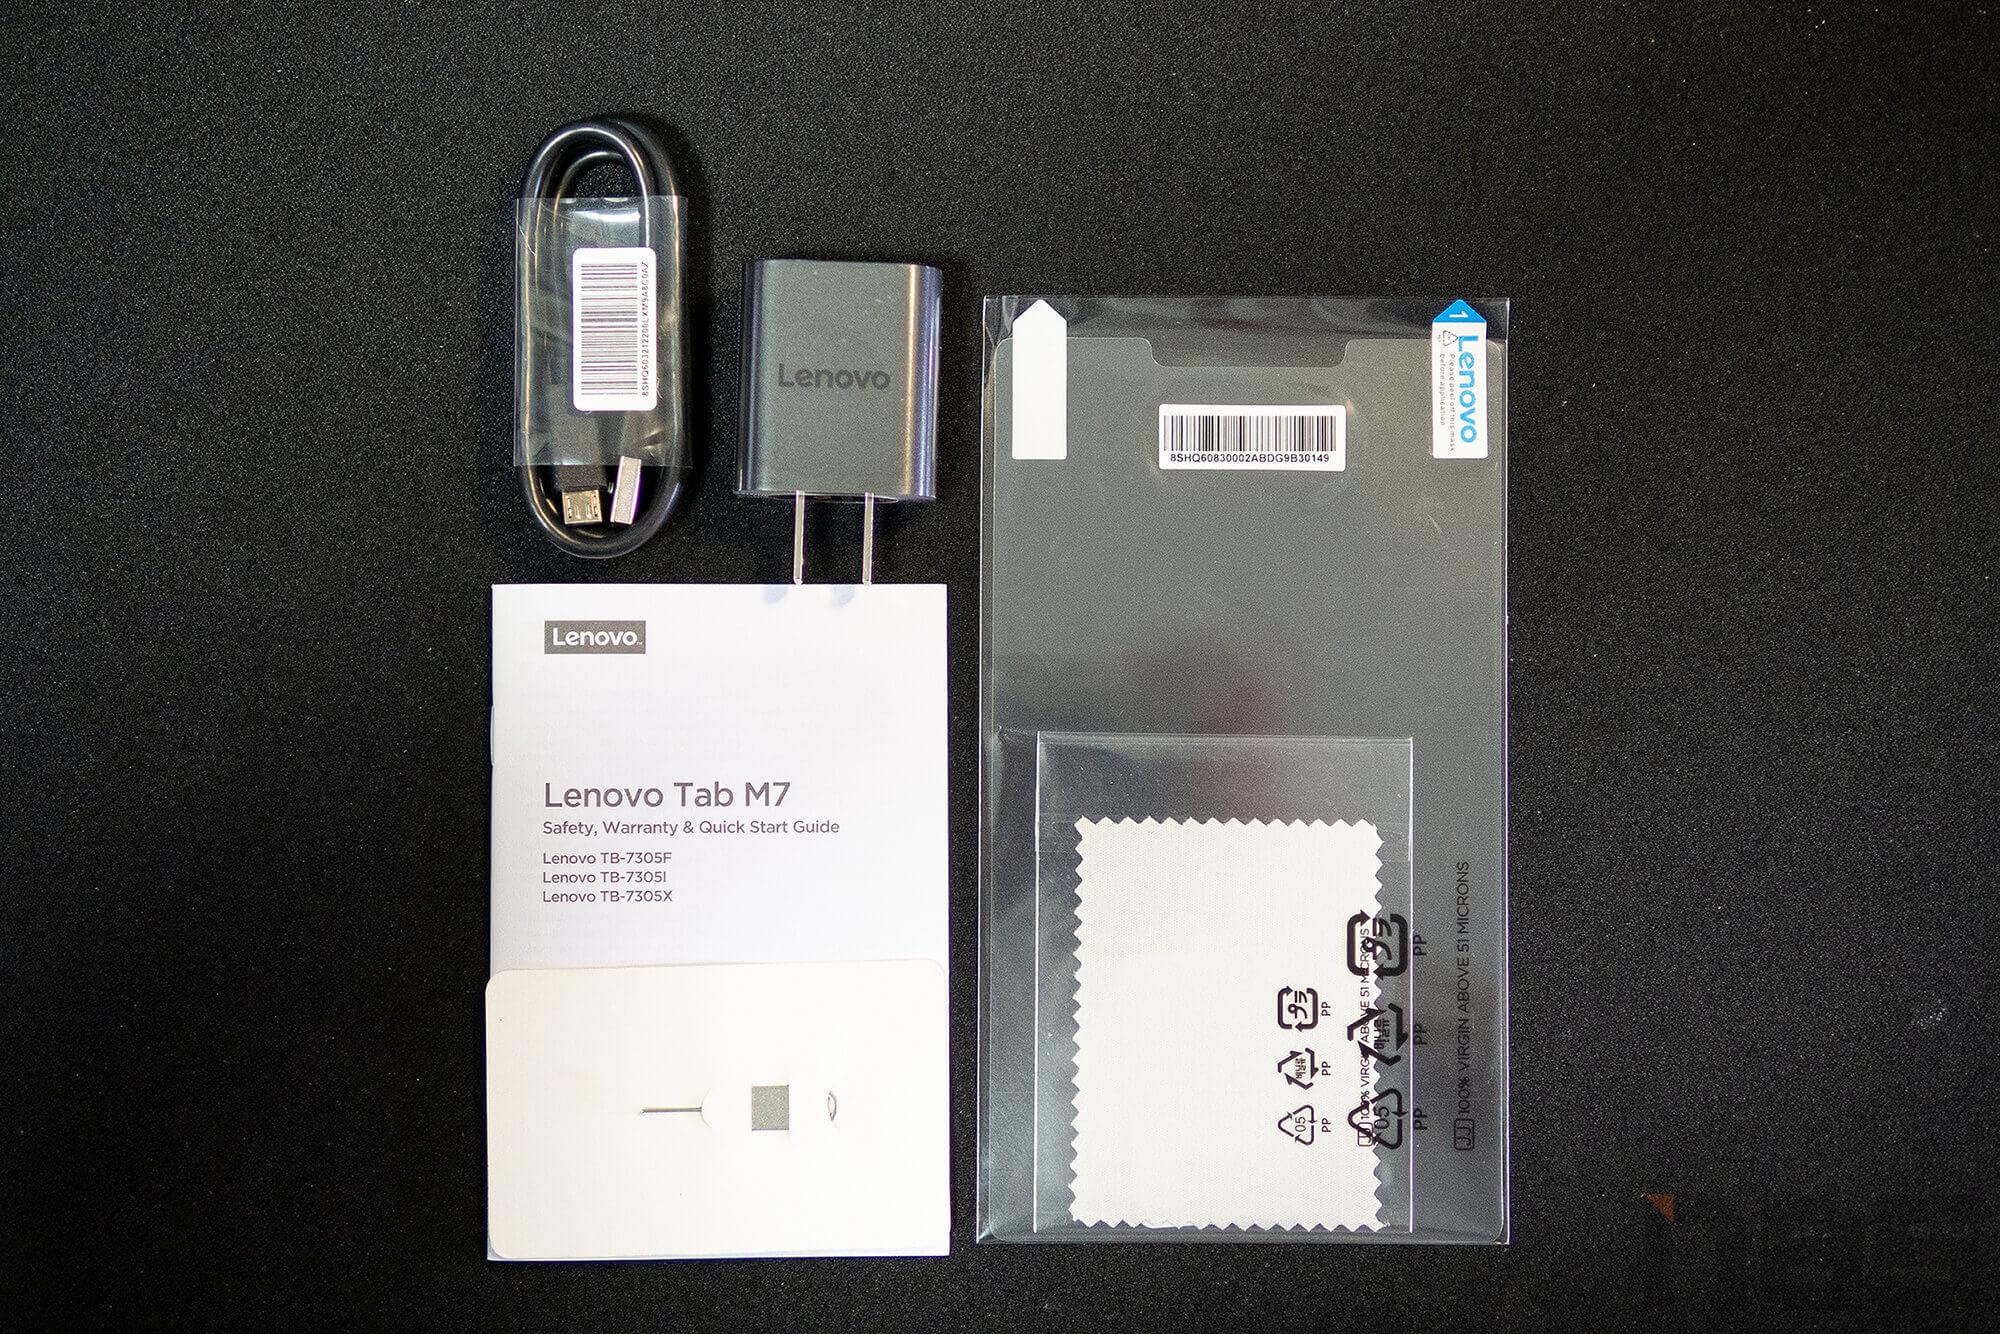 Review Lenovo Tab M7 NotebookSPEC 4